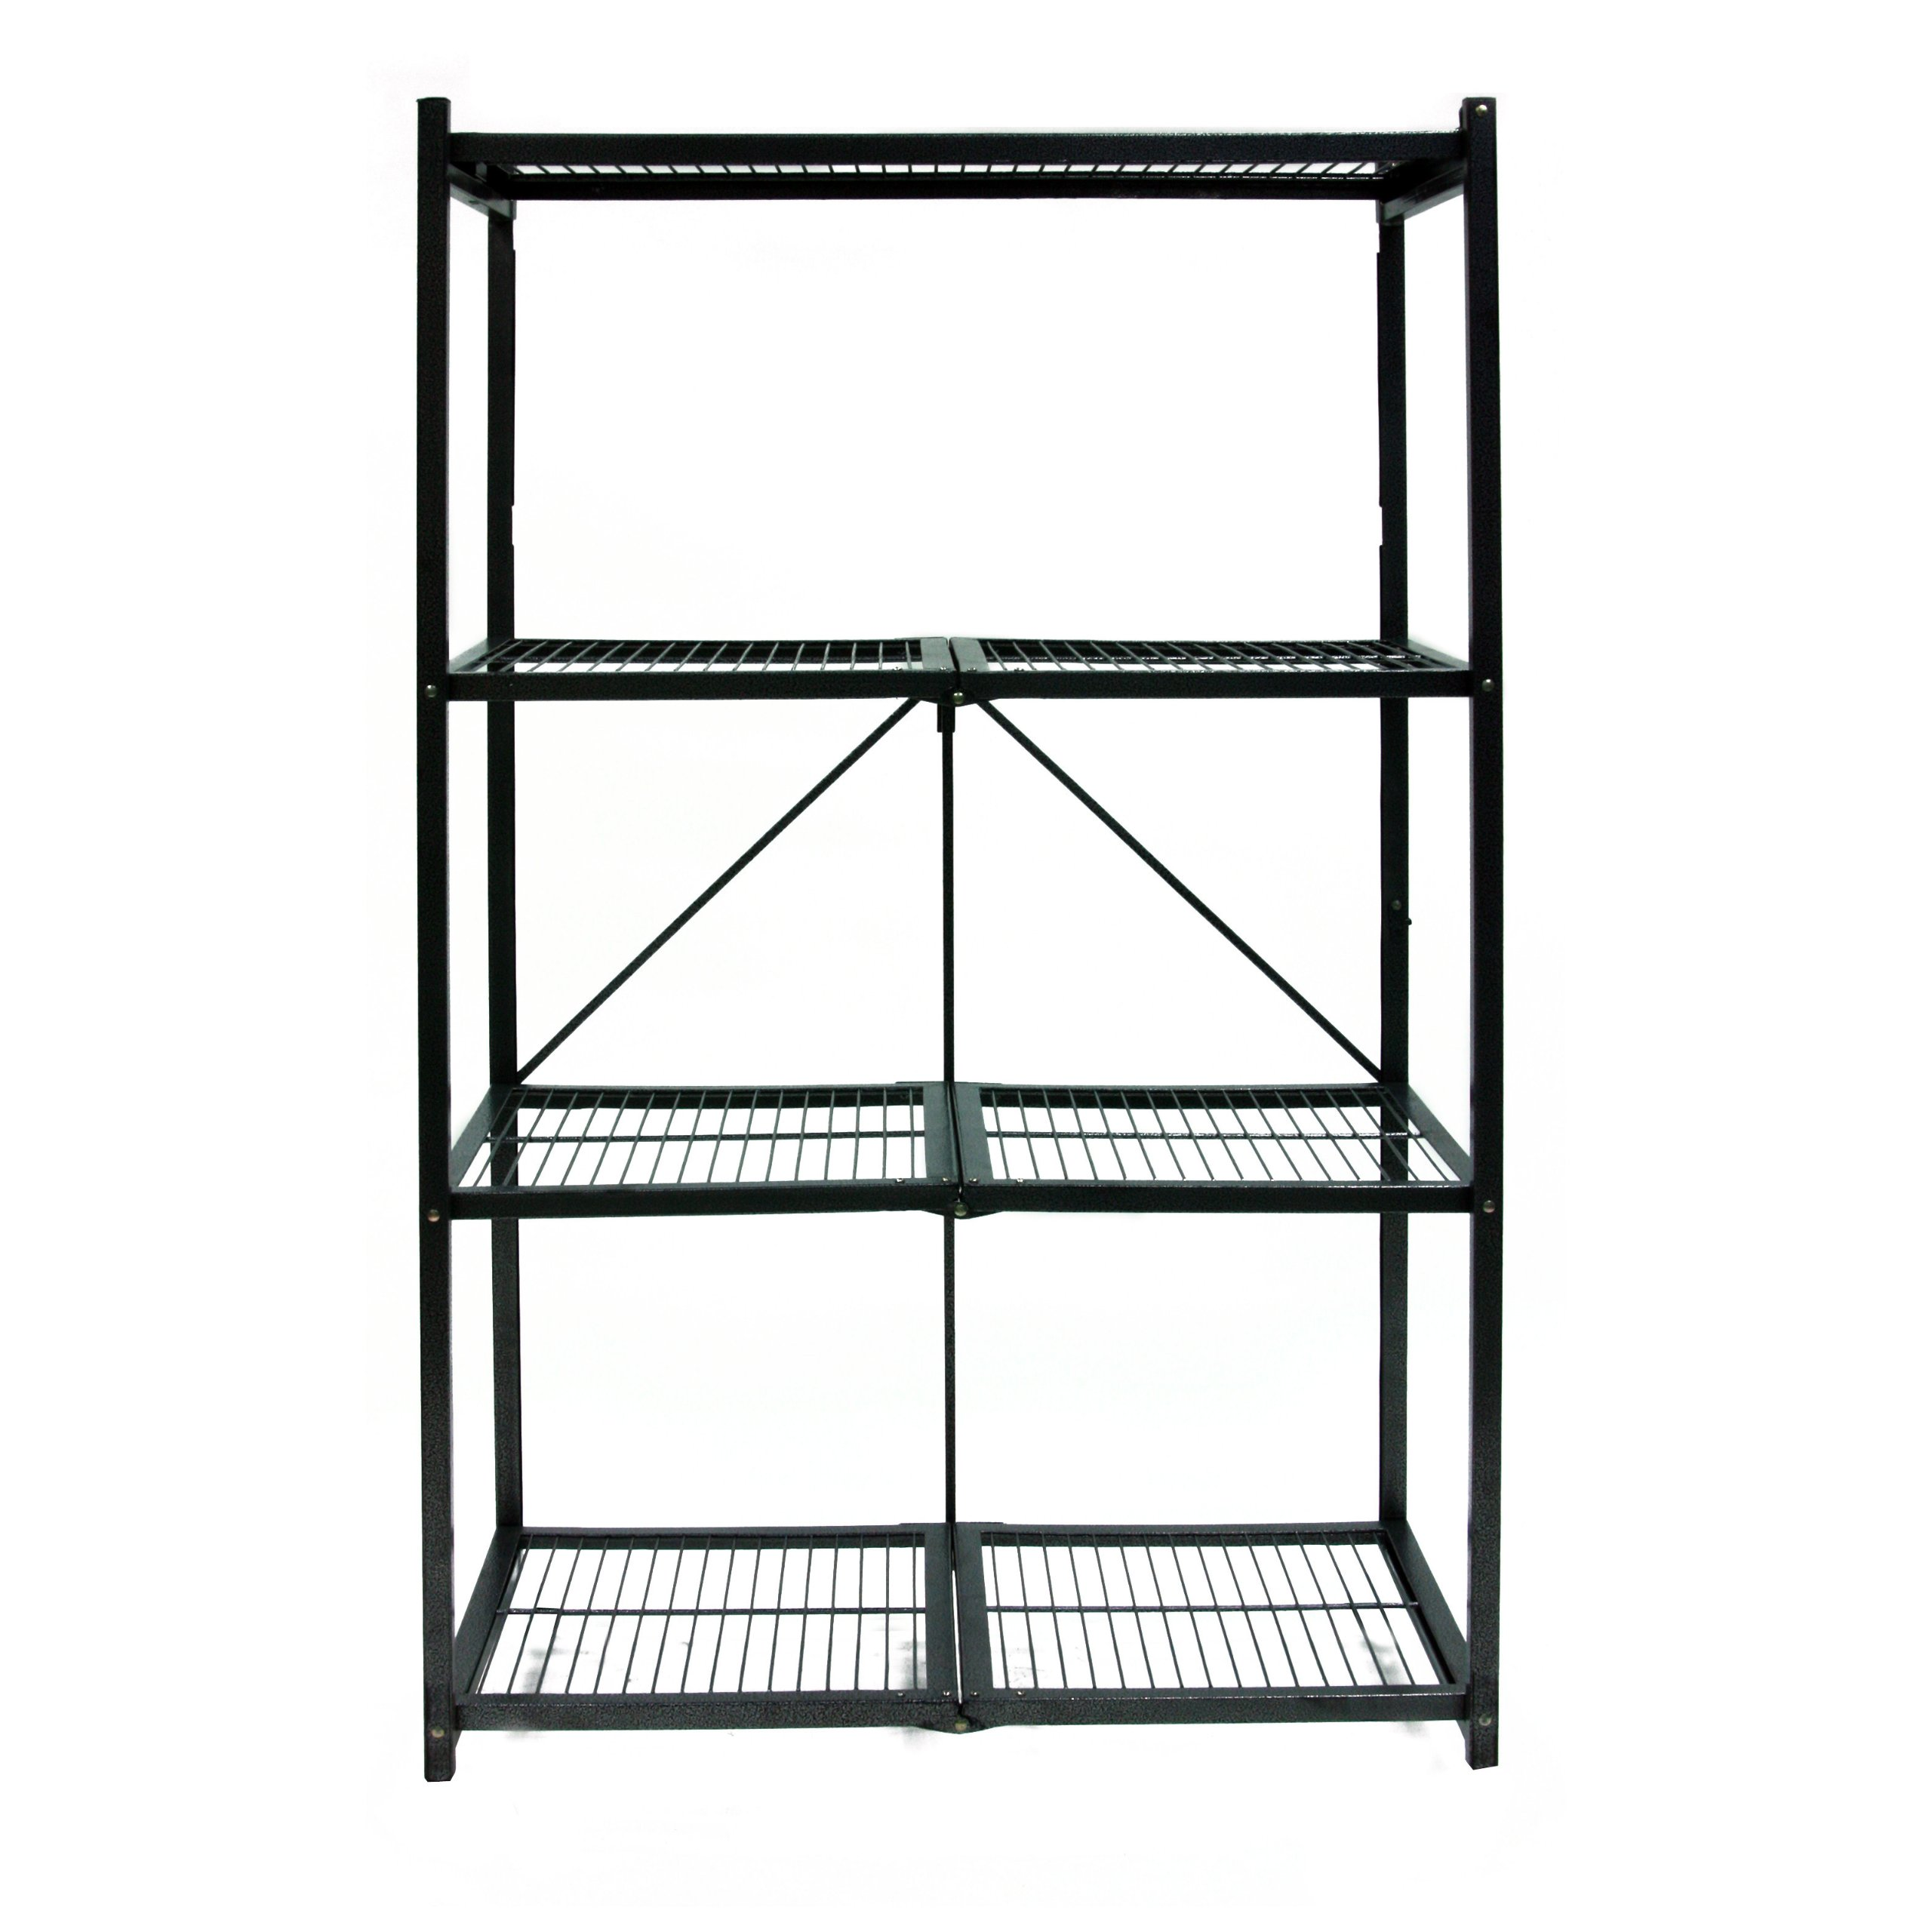 Origami R5-01 General Purpose 4-Shelf Steel Collapsible Storage Rack, Large